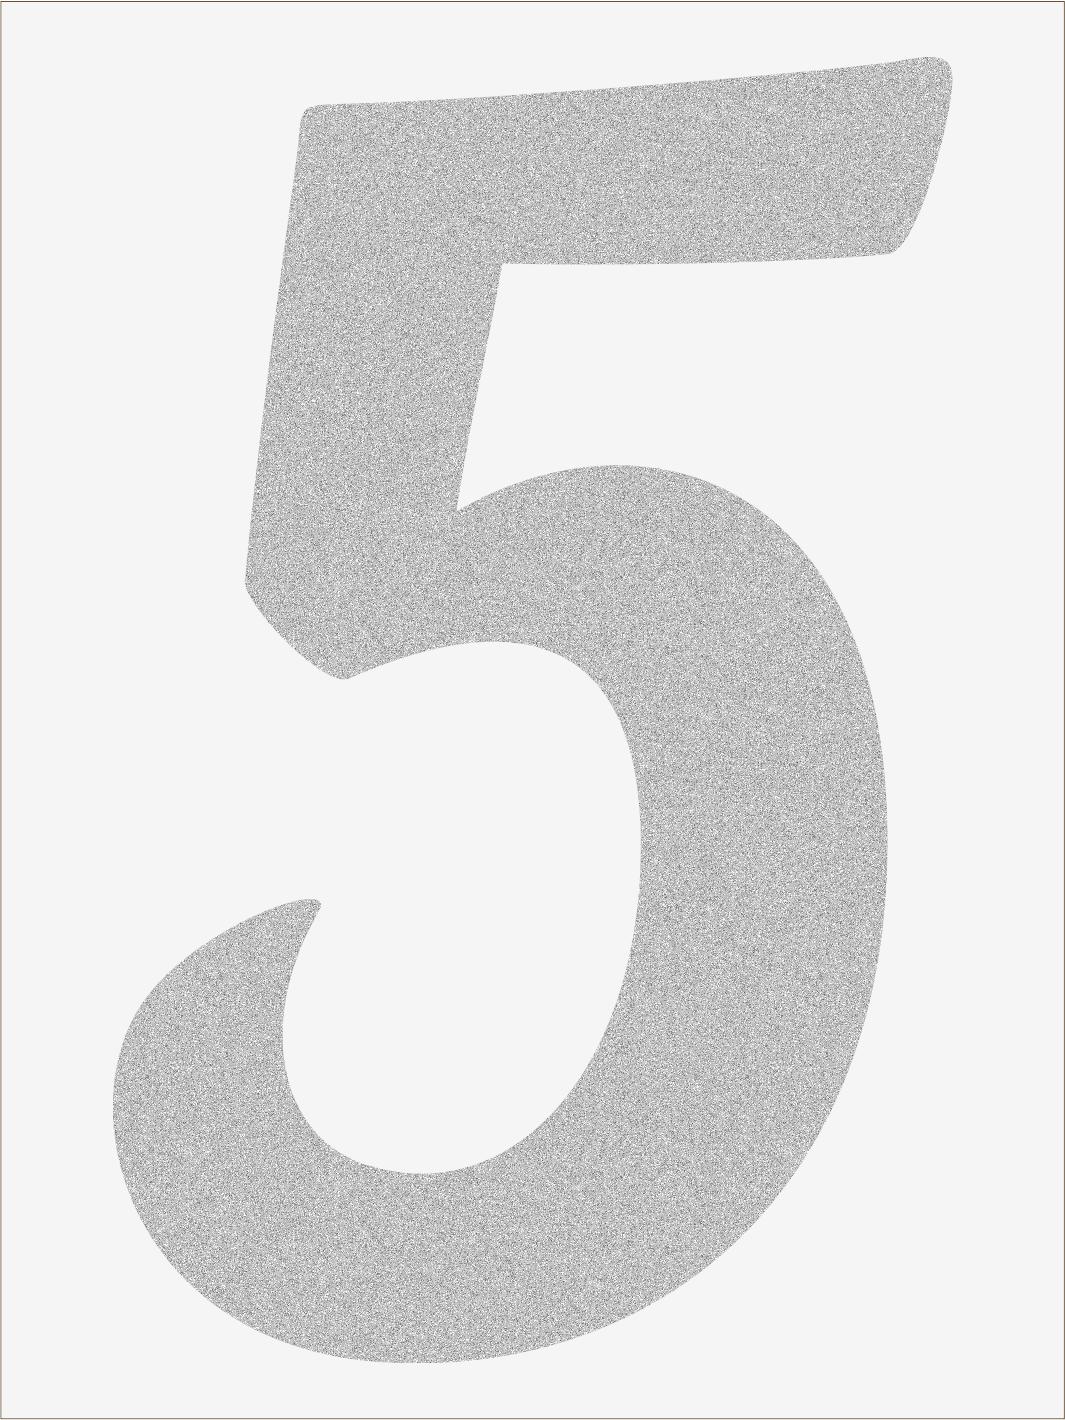 Číslica 5 font1